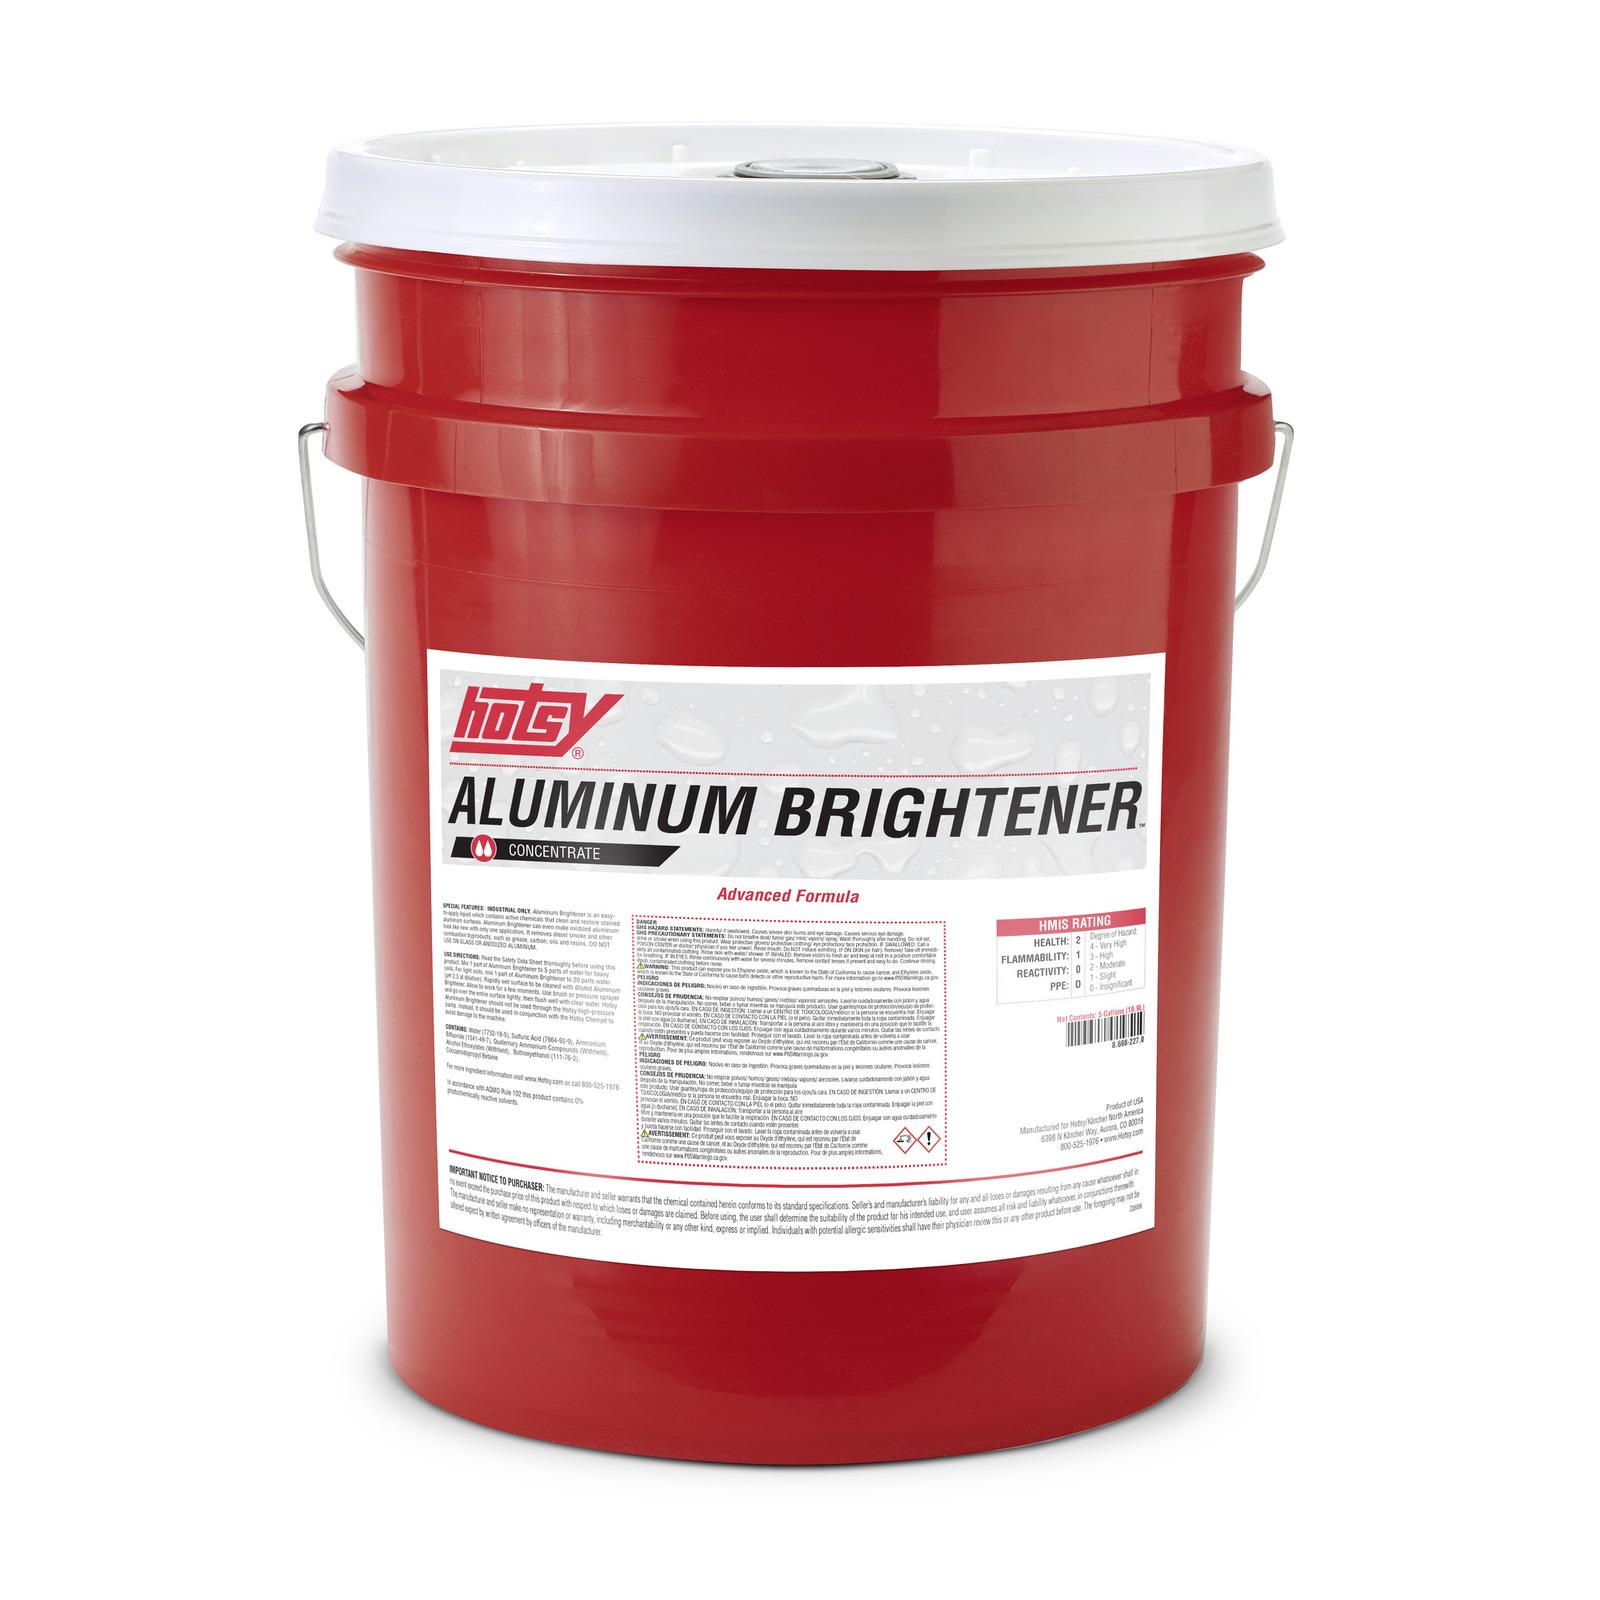 Advanced Formula Aluminum Brightener | Hotsy